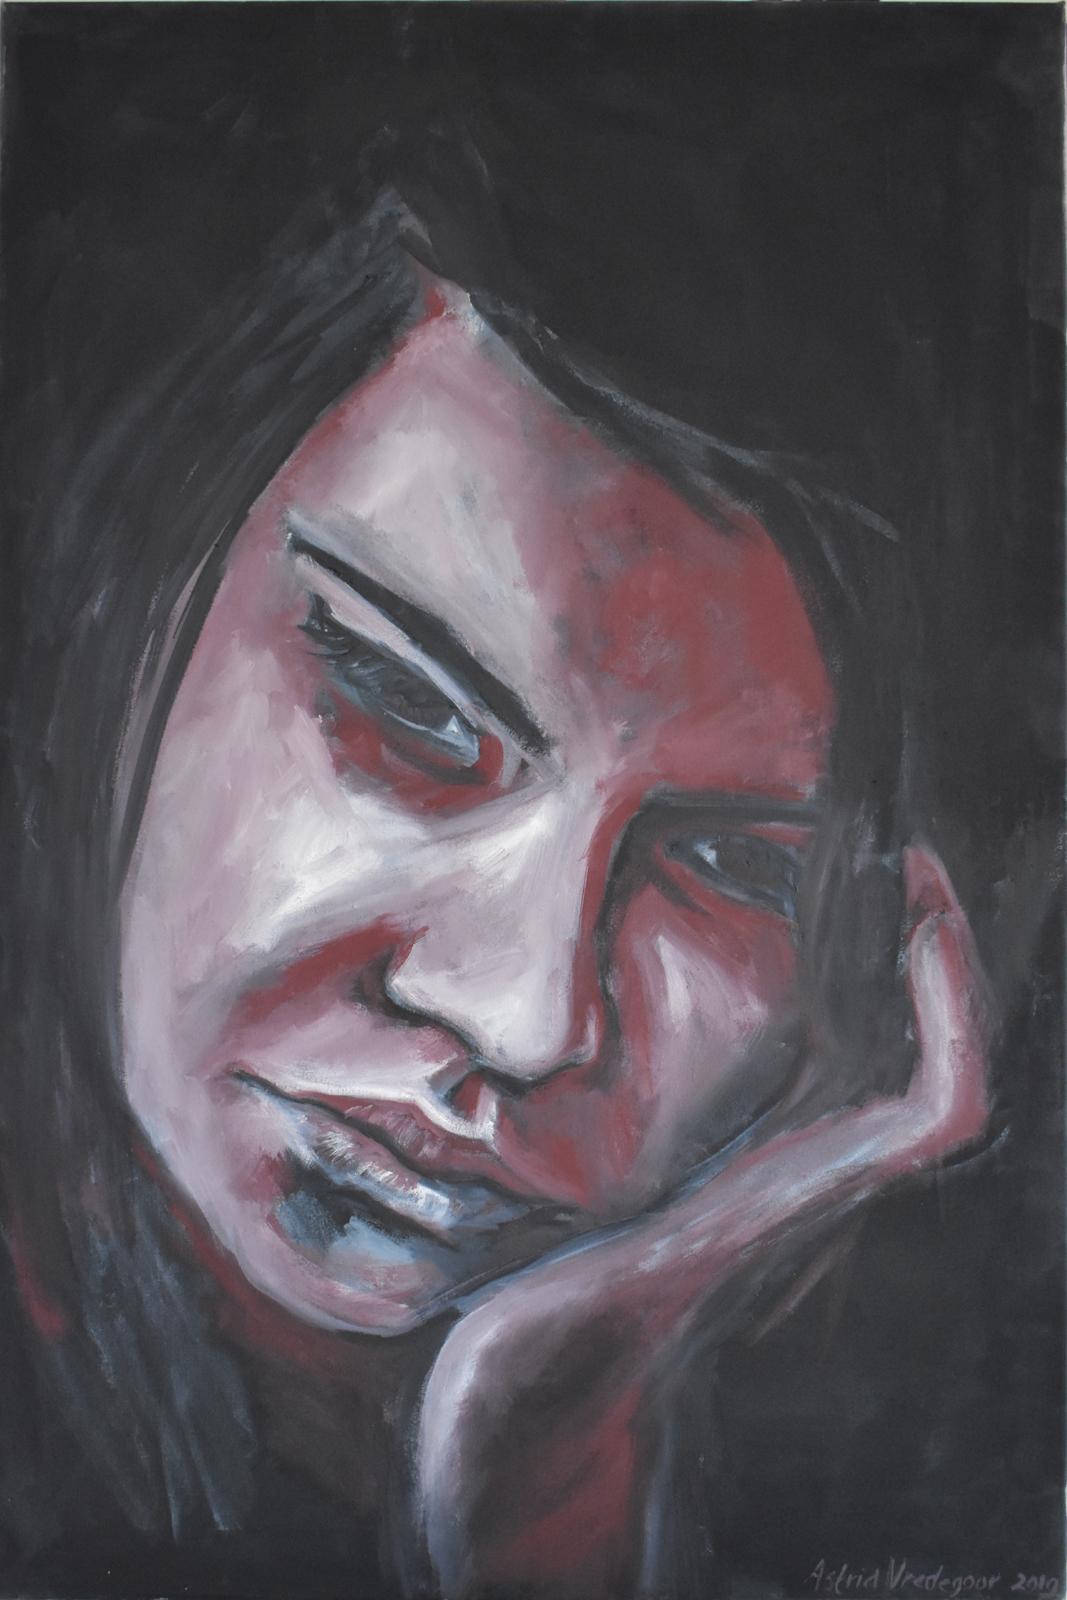 Twilight ( depression among young people )